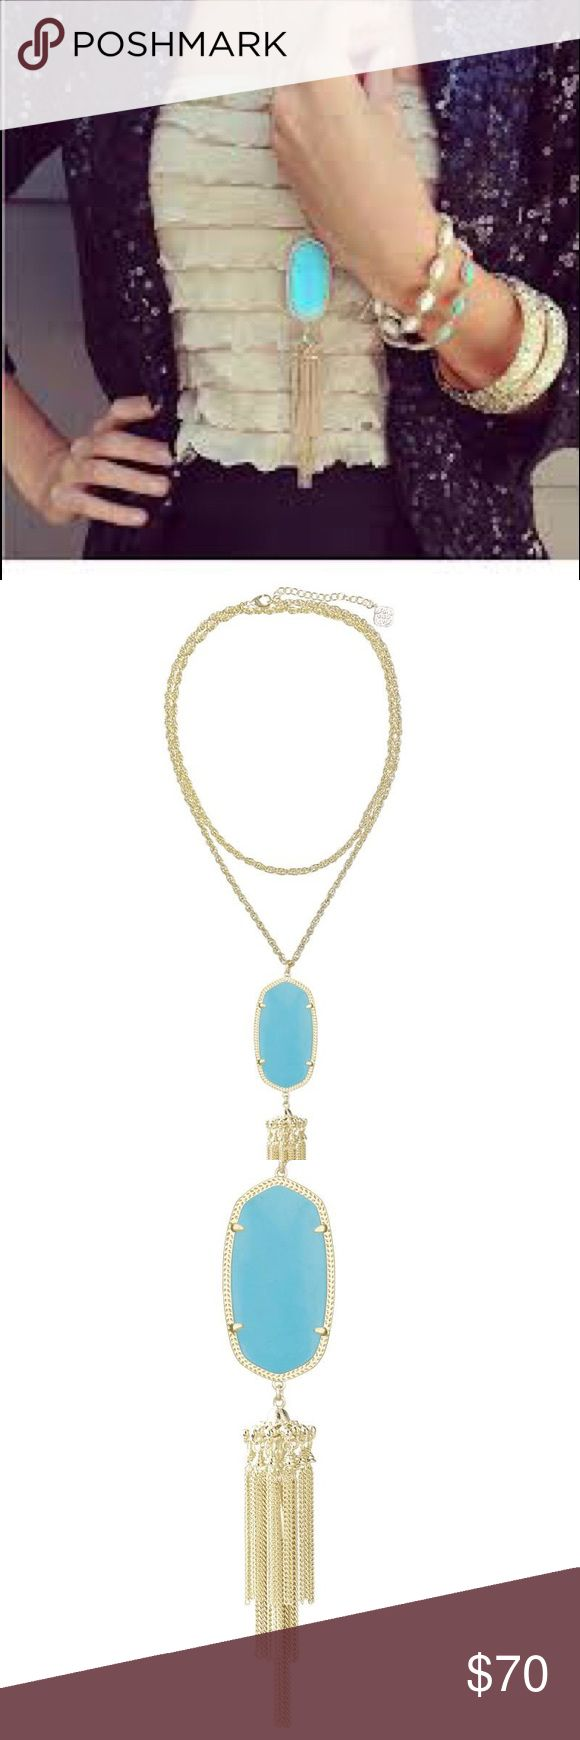 Kendra Scott Rayne Long Tassel Necklace, Turquoise Never worn! Beautiful gold turquoise tassel necklace from Kendra Scott. Comes with Kendra Scott jewelry bag. Love! 💕 Kendra Scott Jewelry Necklaces